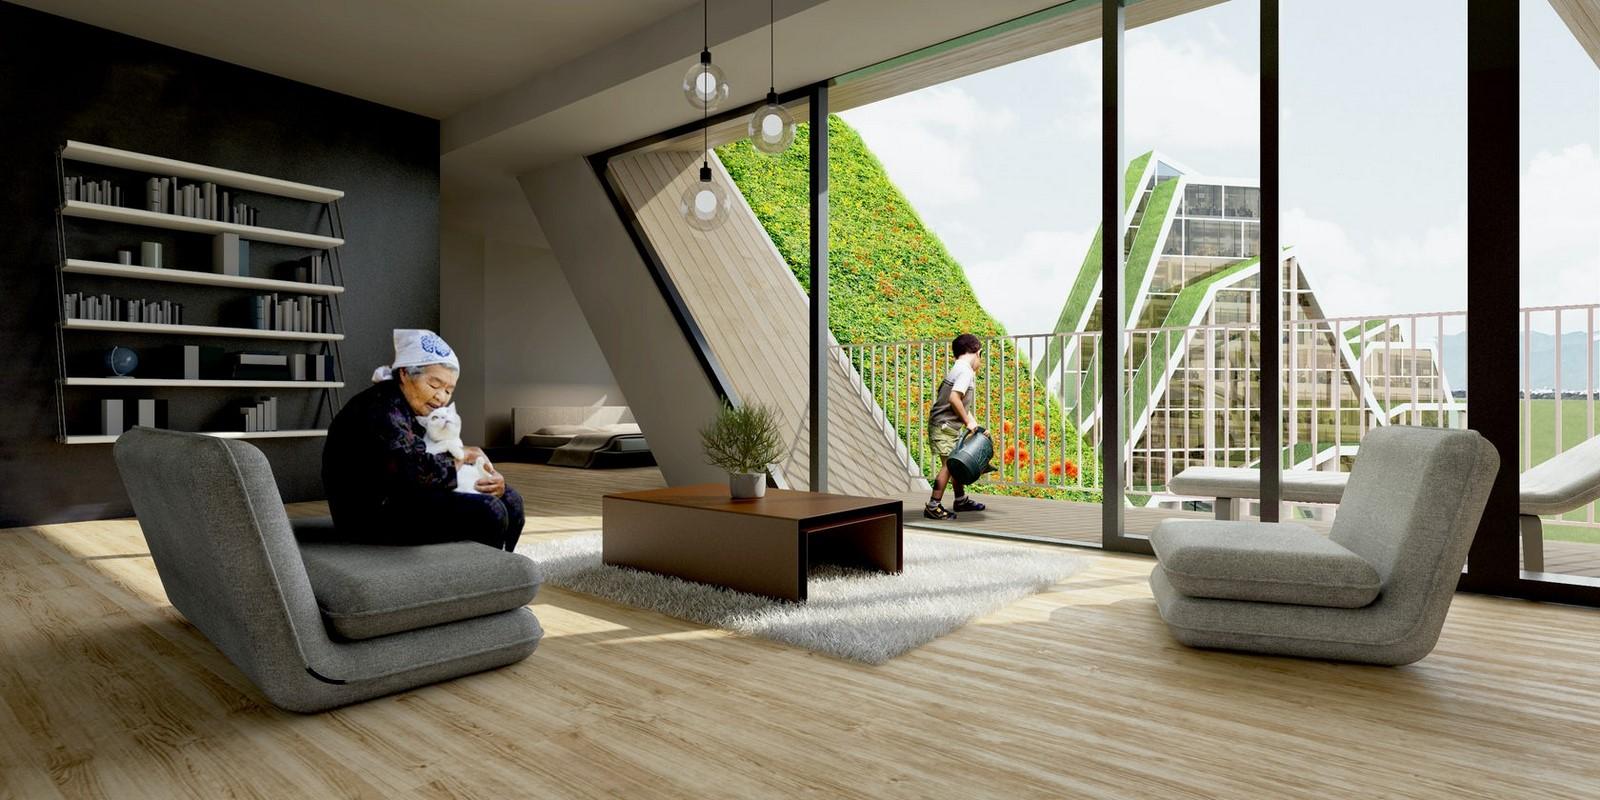 Hualien Residences by BIG: A Mountain-Shaped Resort - Sheet26